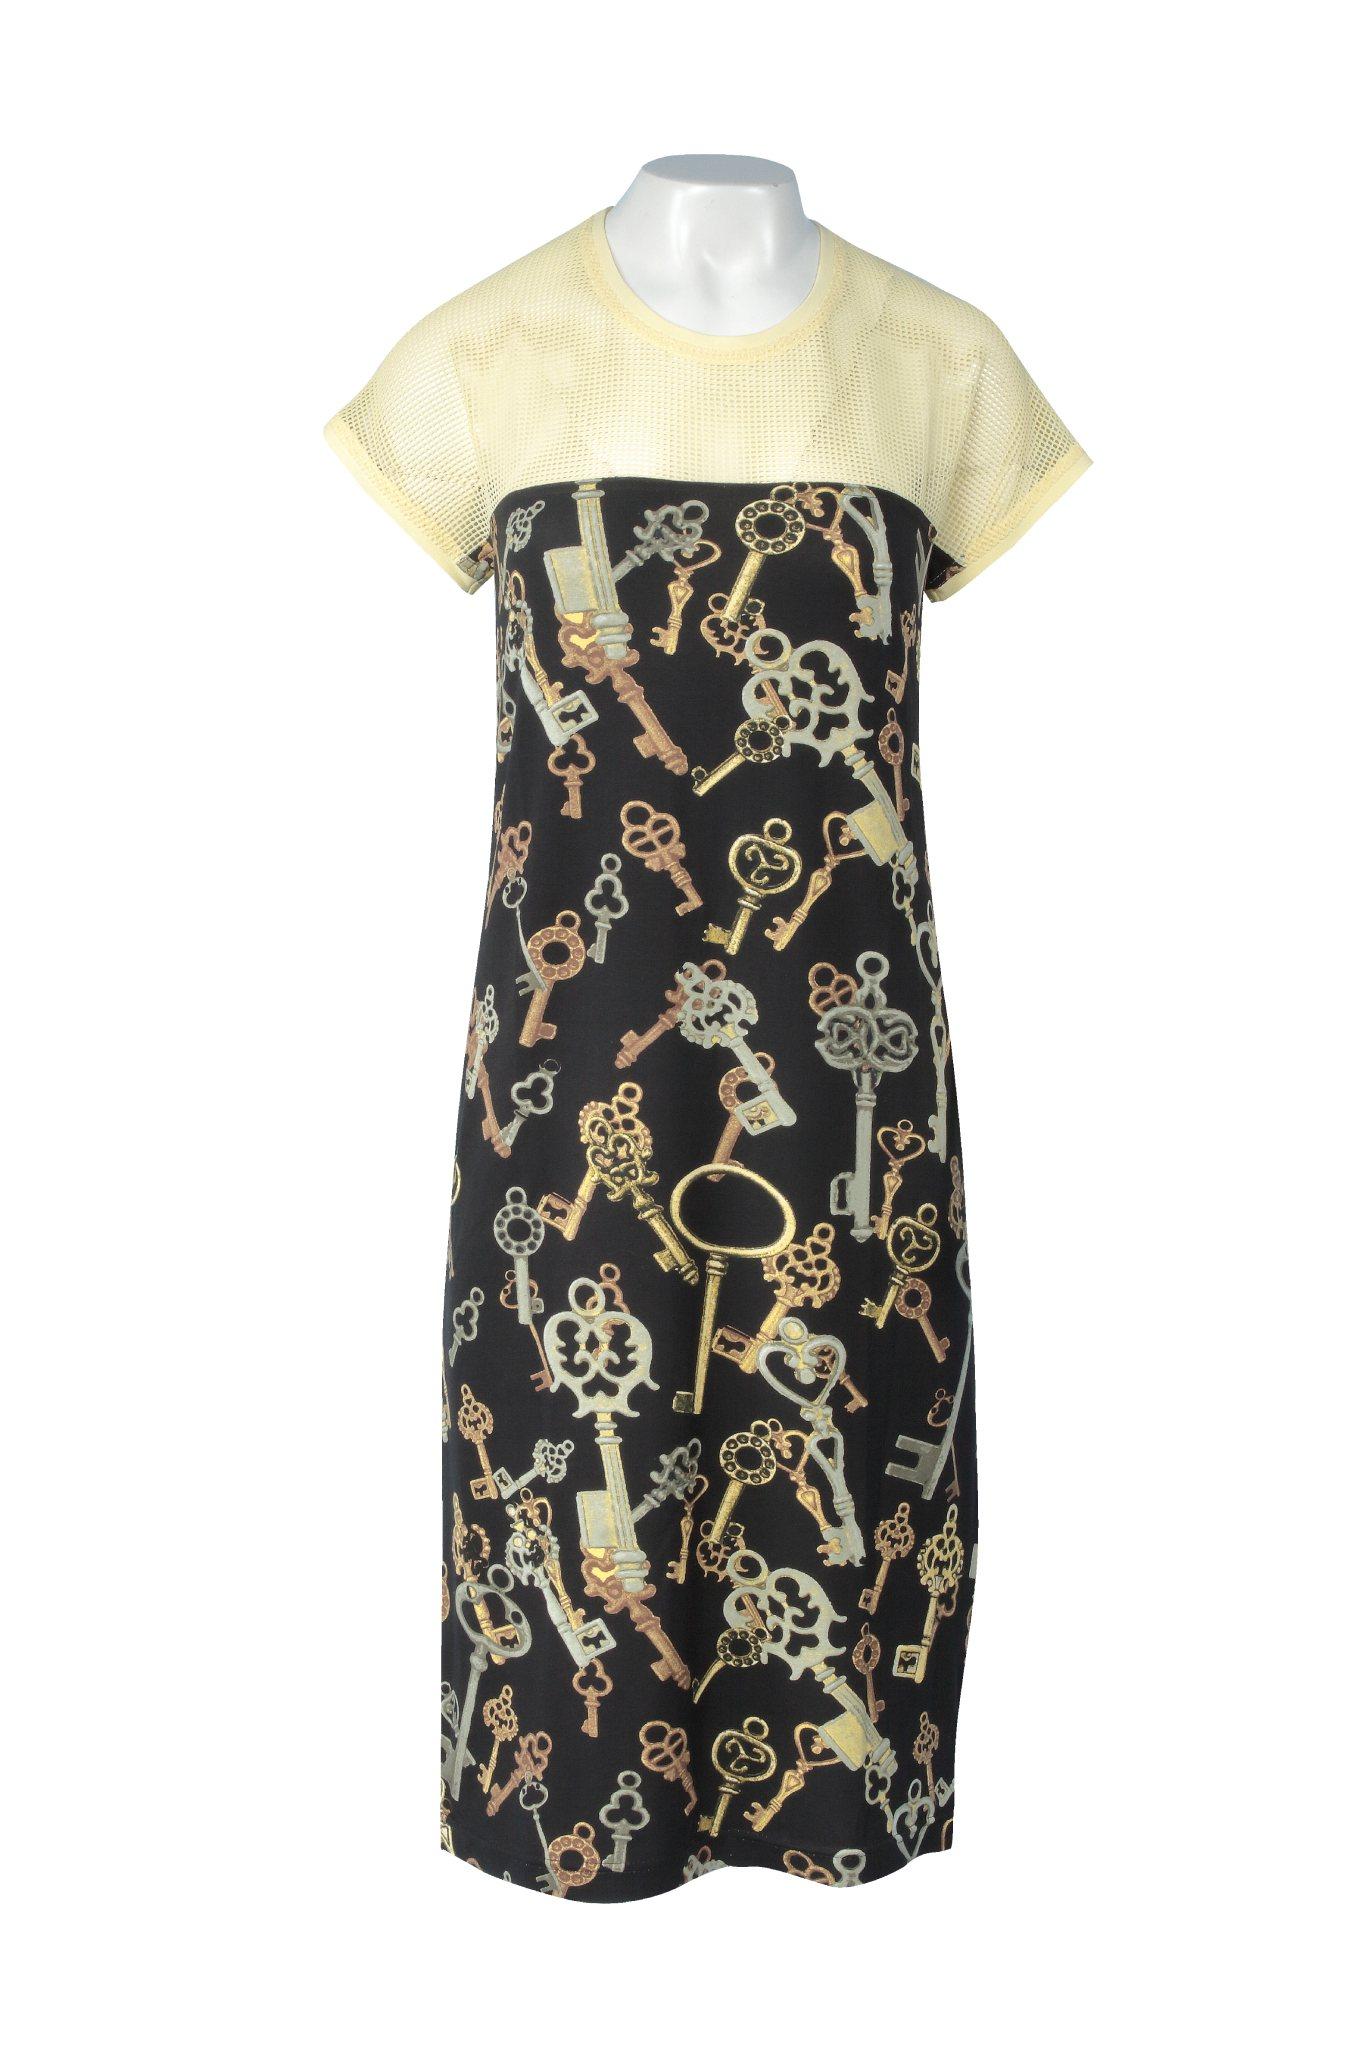 910 Jumitex sukienka w klucze